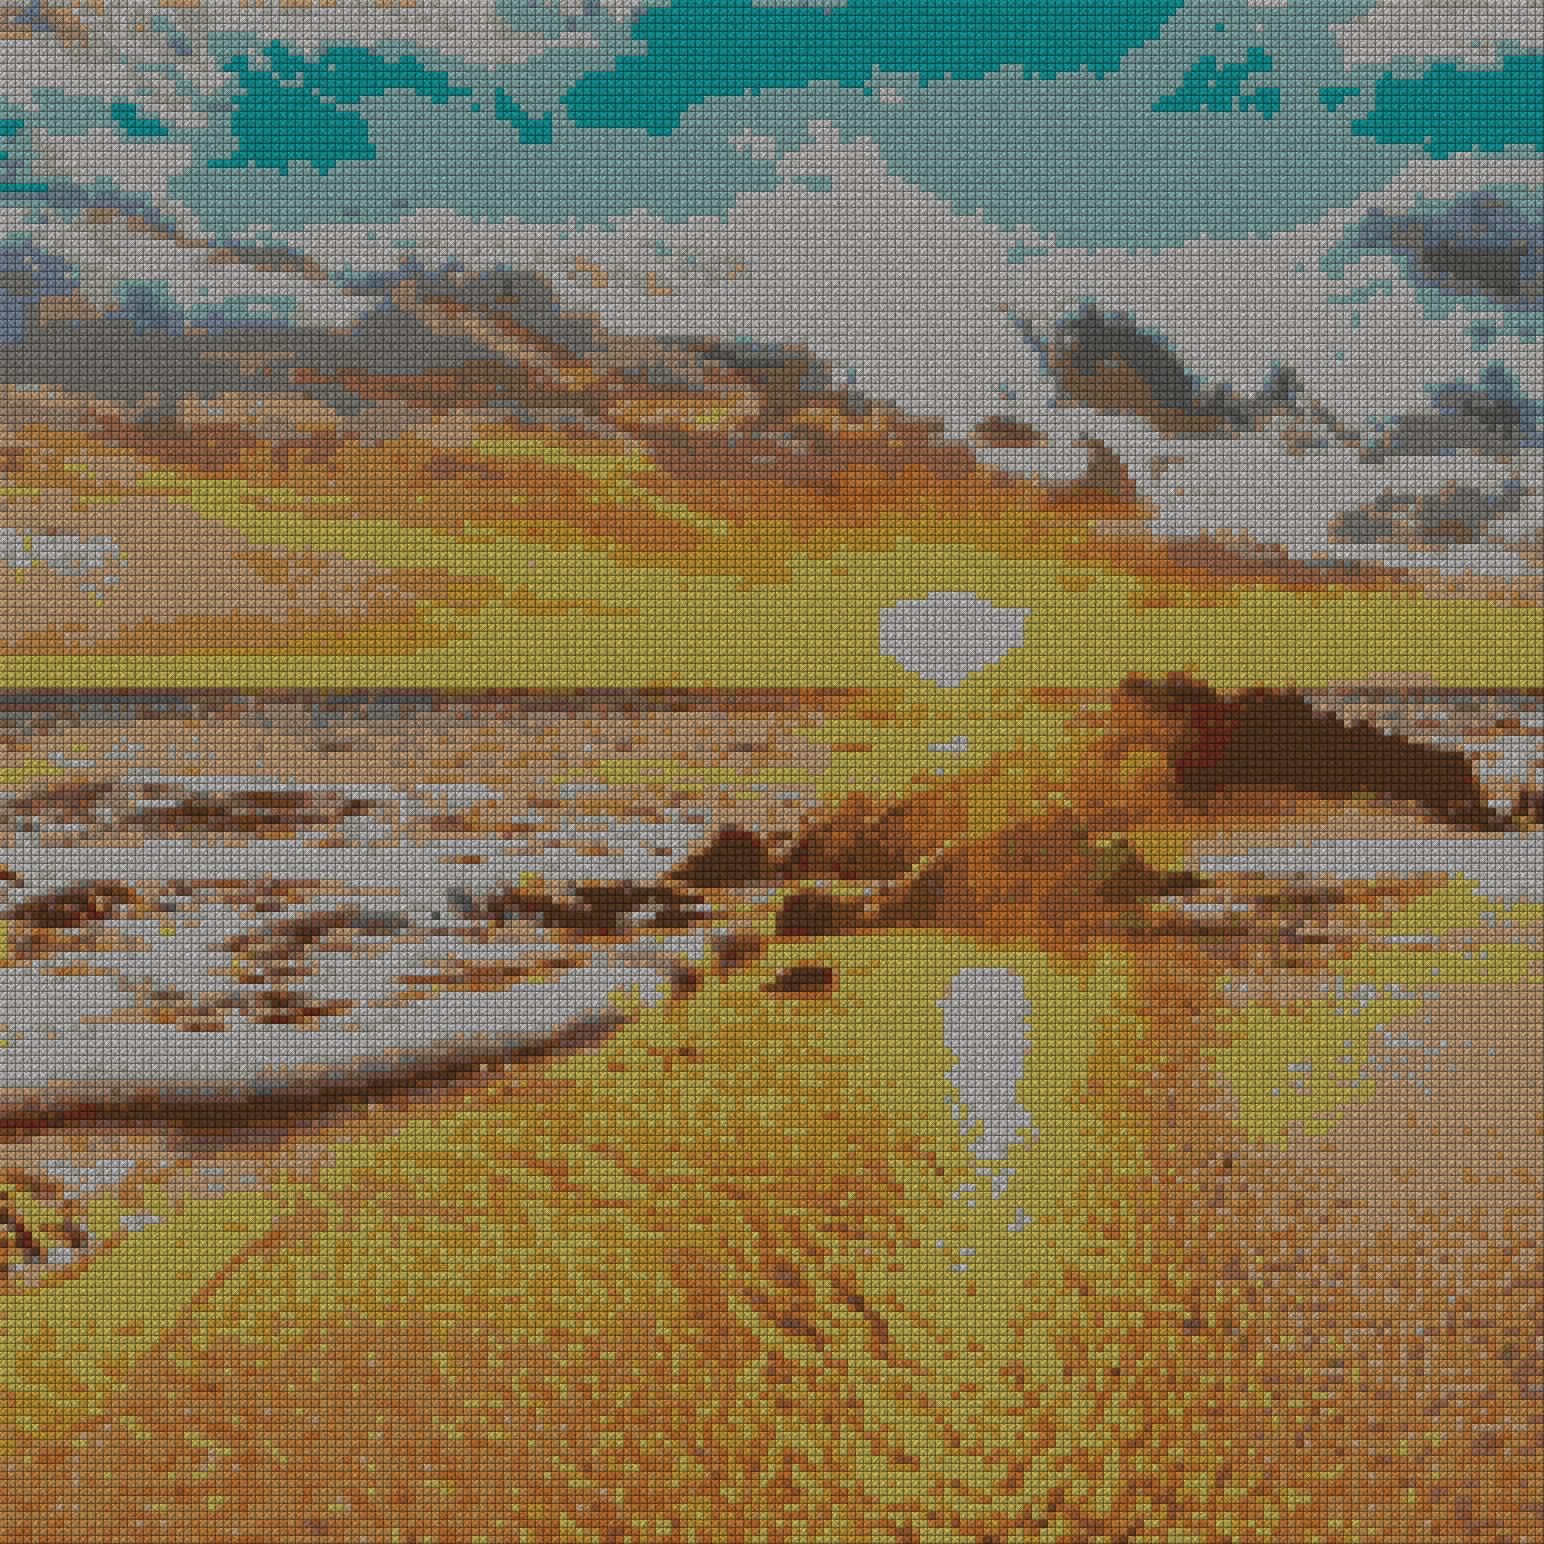 schemi_misti/misti2/tramonto_193x193.jpg